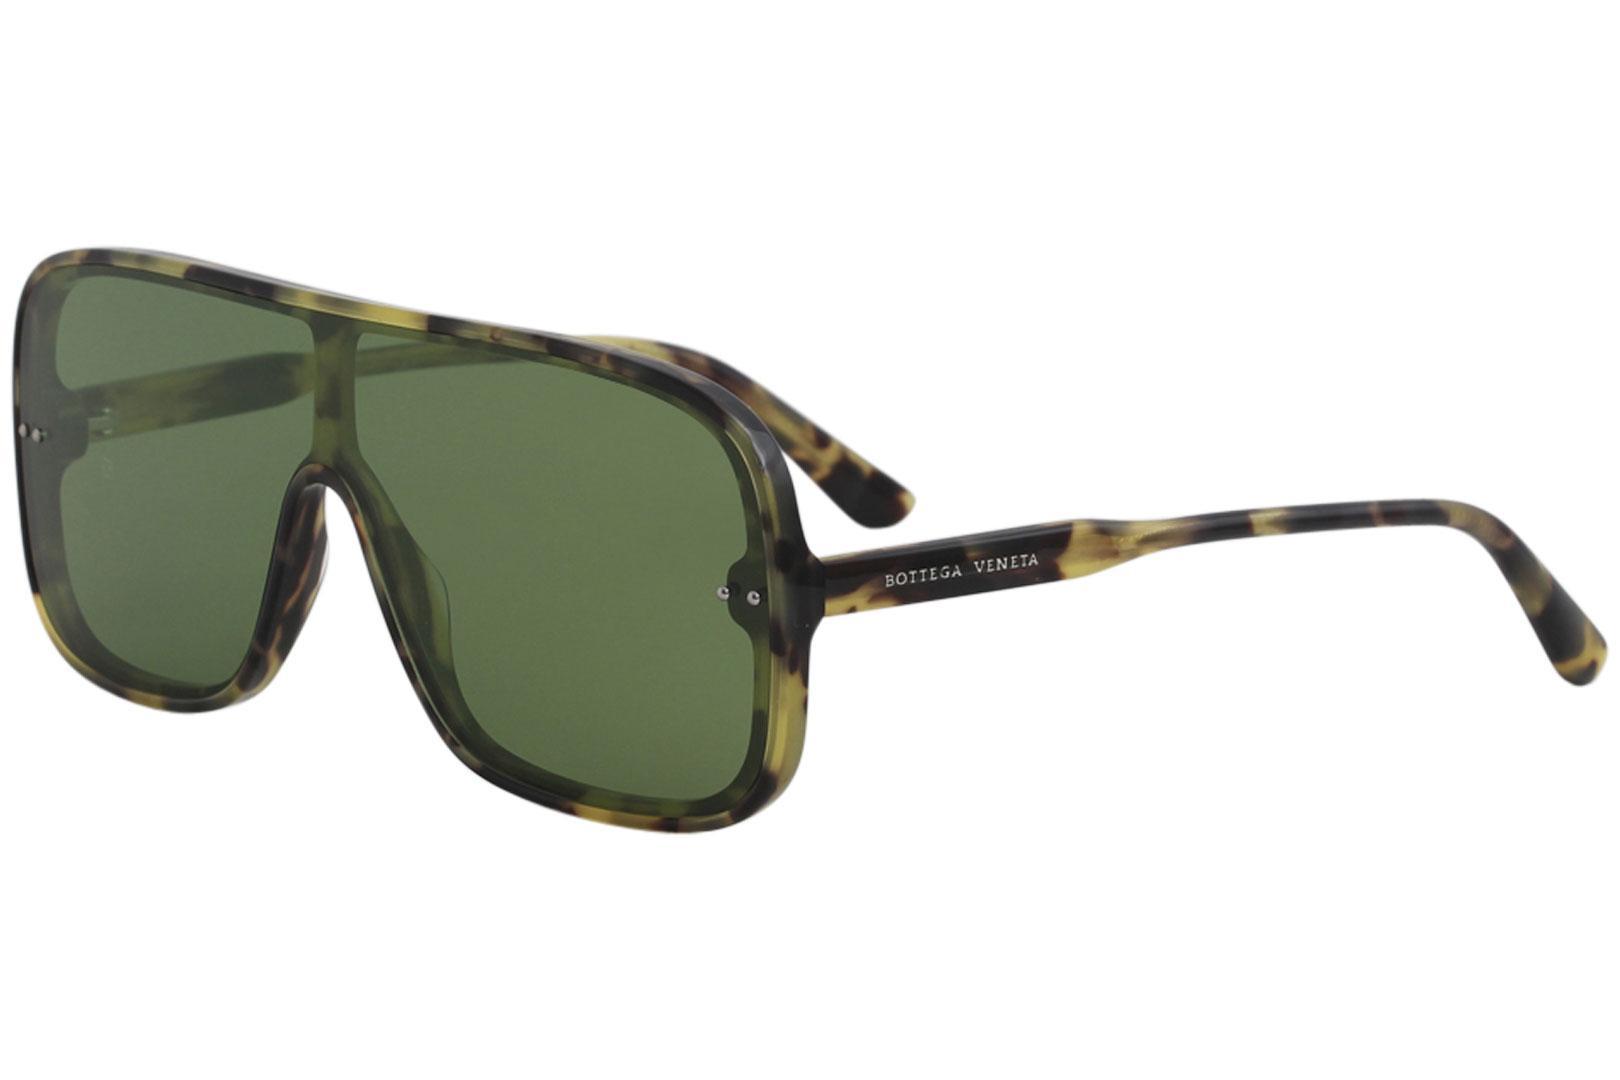 b199d597f85a Bottega Veneta Men s BV0167S BV 0167 S Fashion Shield Sunglasses